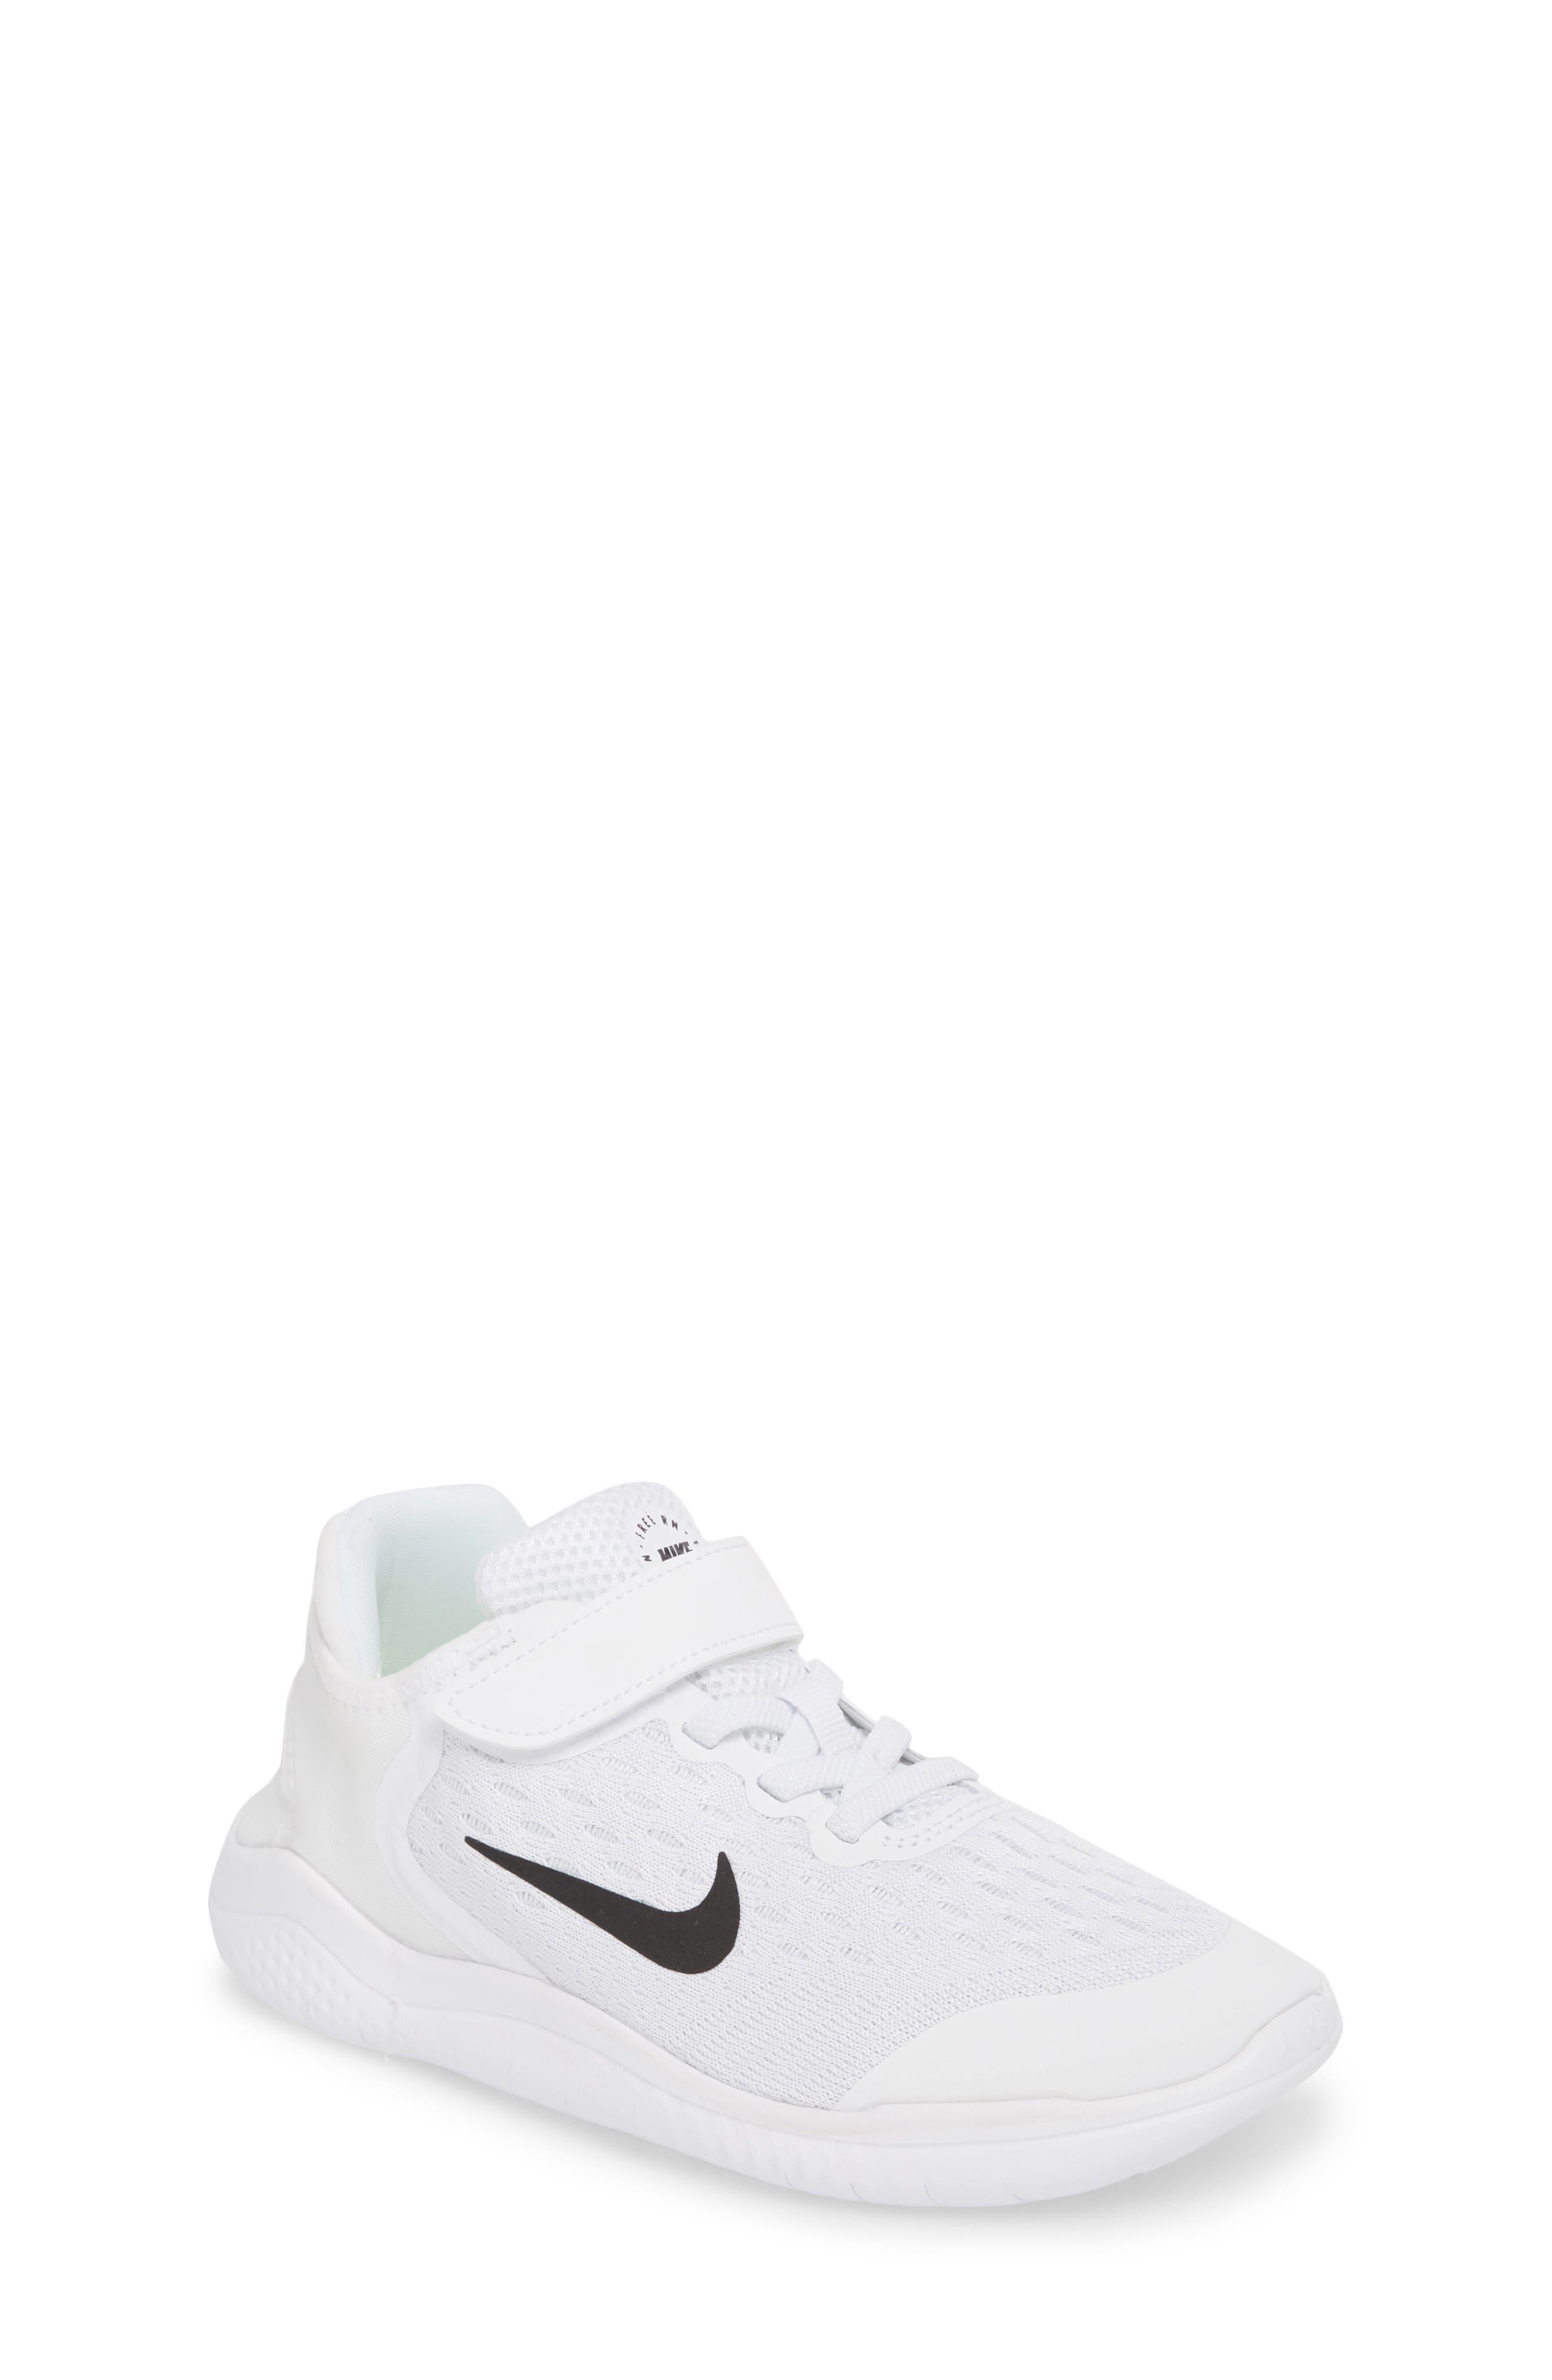 Nike Free RN Running Shoe (Baby, Walker, Toddler & Little Kid)